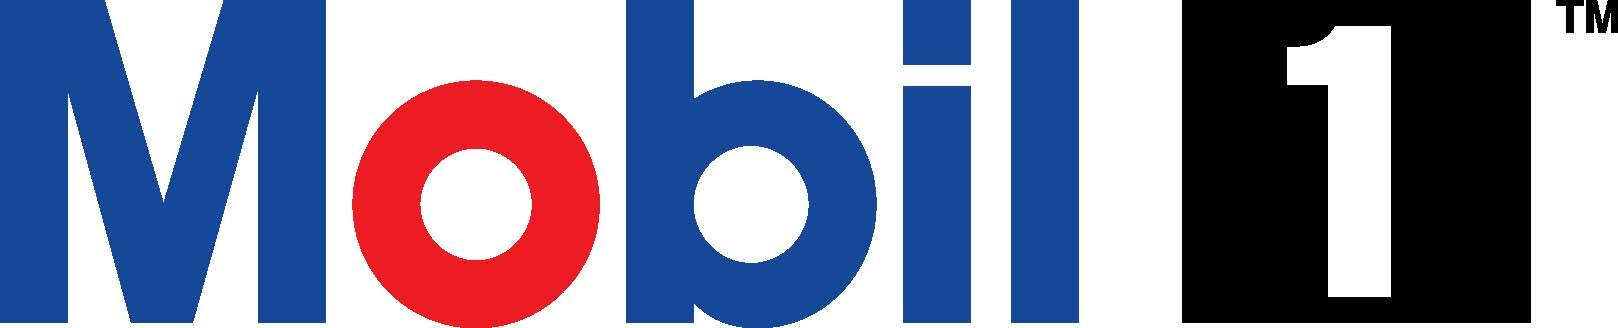 M1_Logo_RGB-TM.jpg